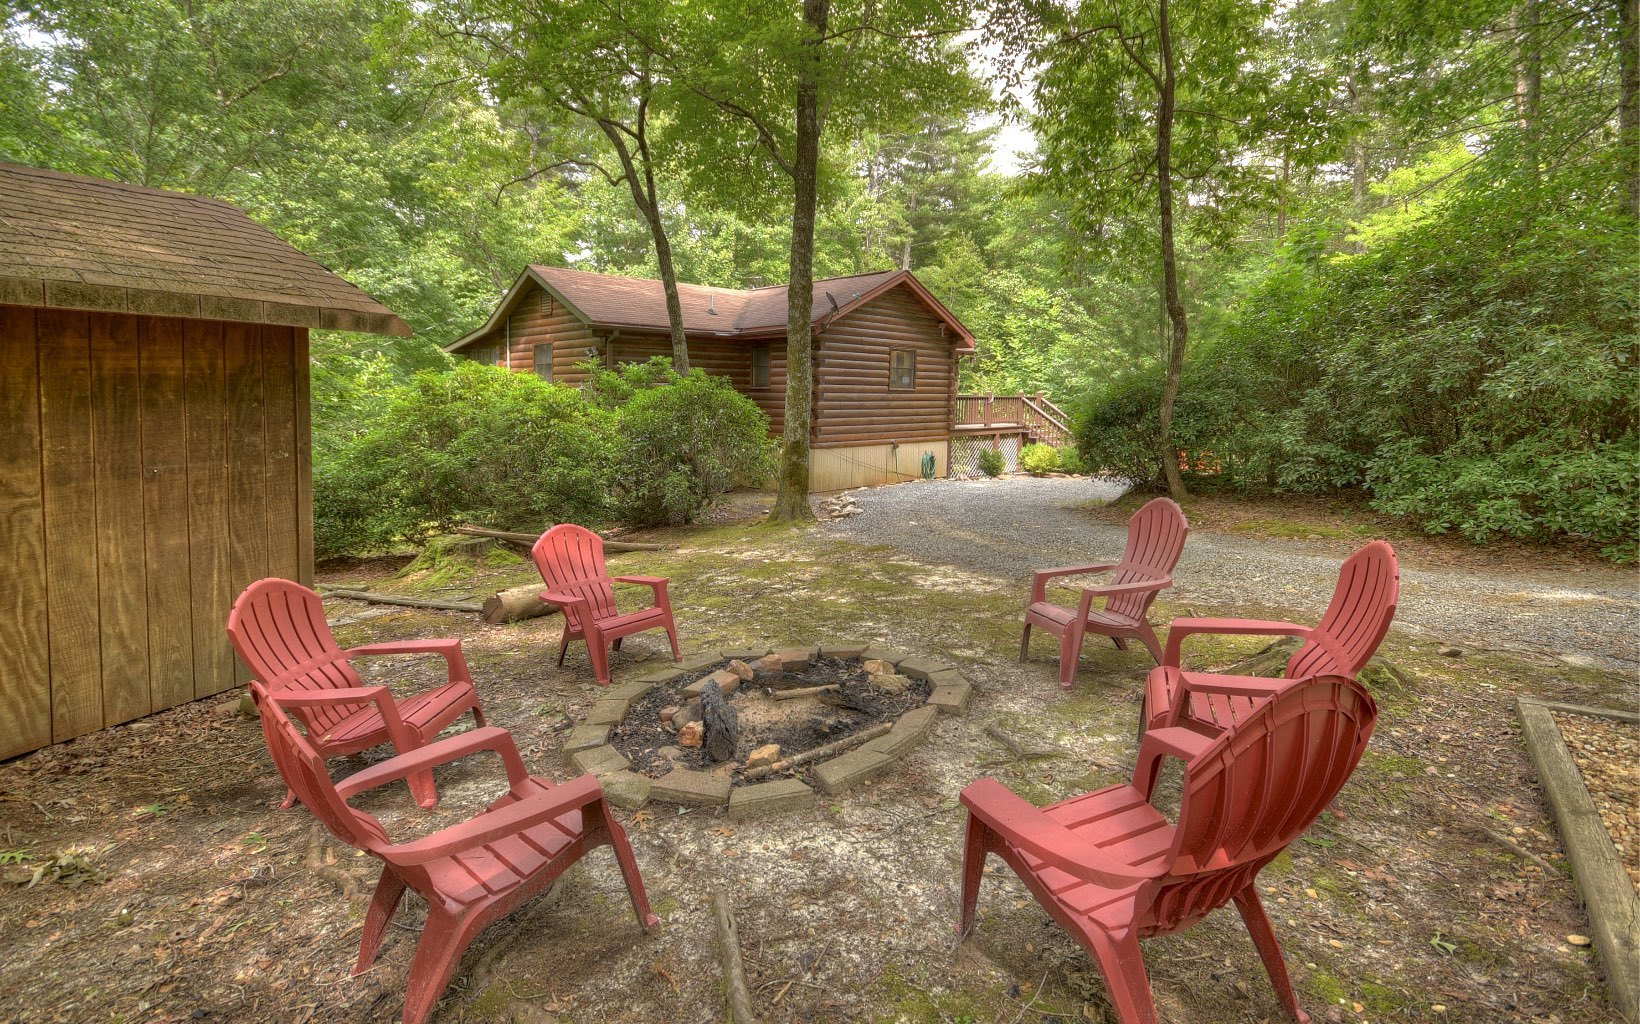 602 Harrison & Ada, Blue Ridge, GA   MLS# 290969   Cozy Cove